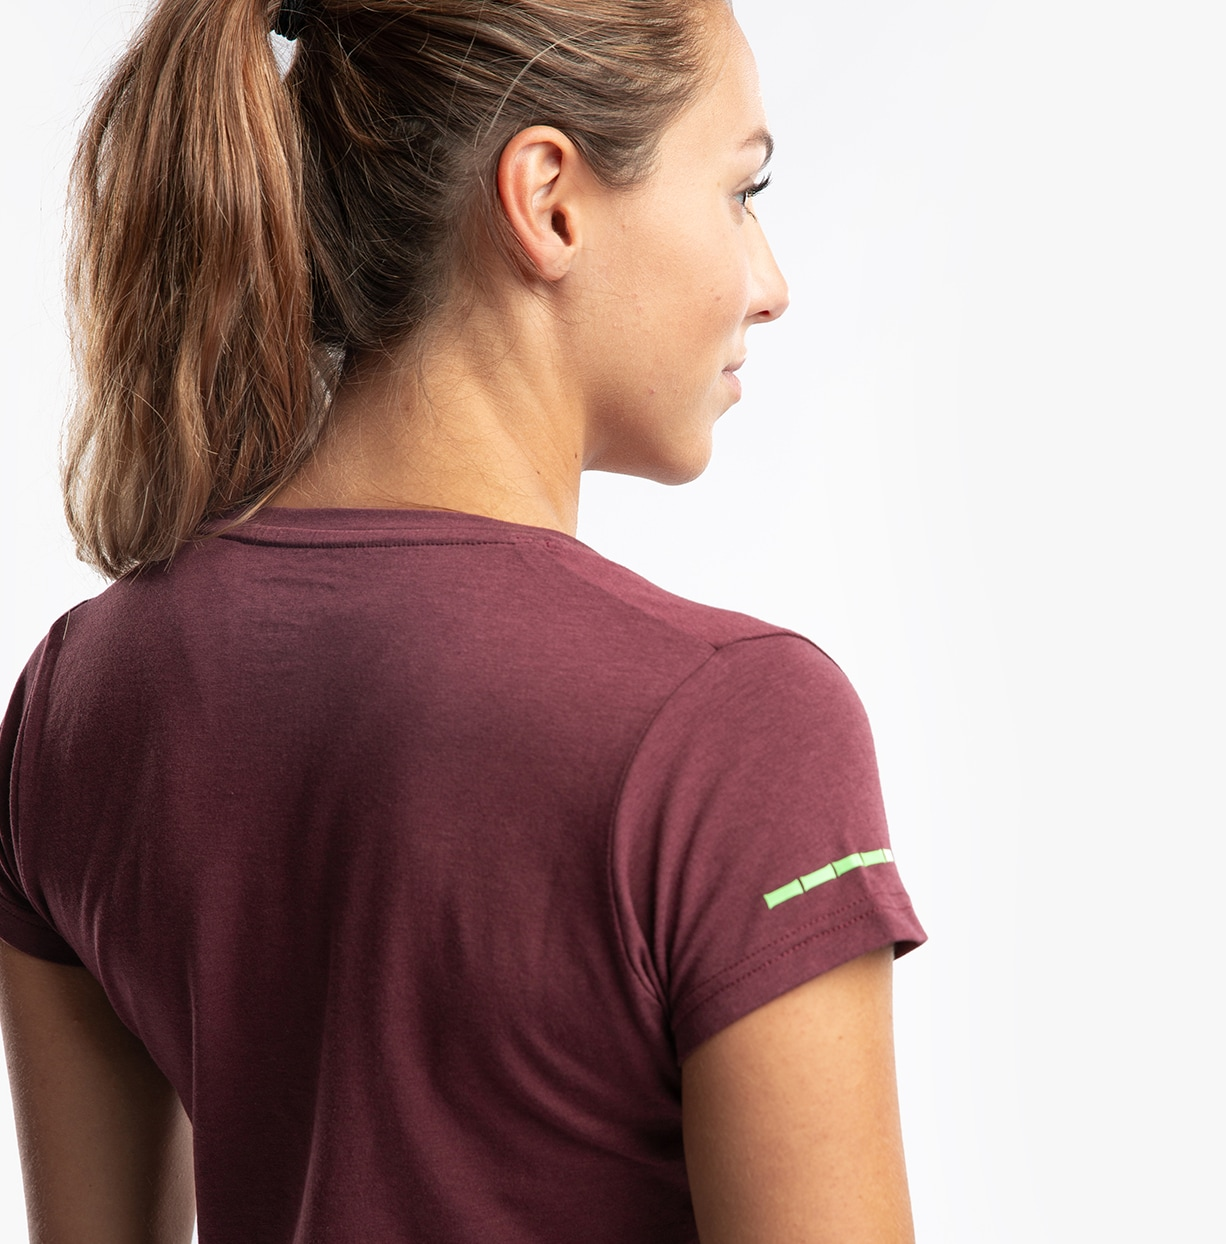 CLN Bamboo ws T-shirt Burgundy